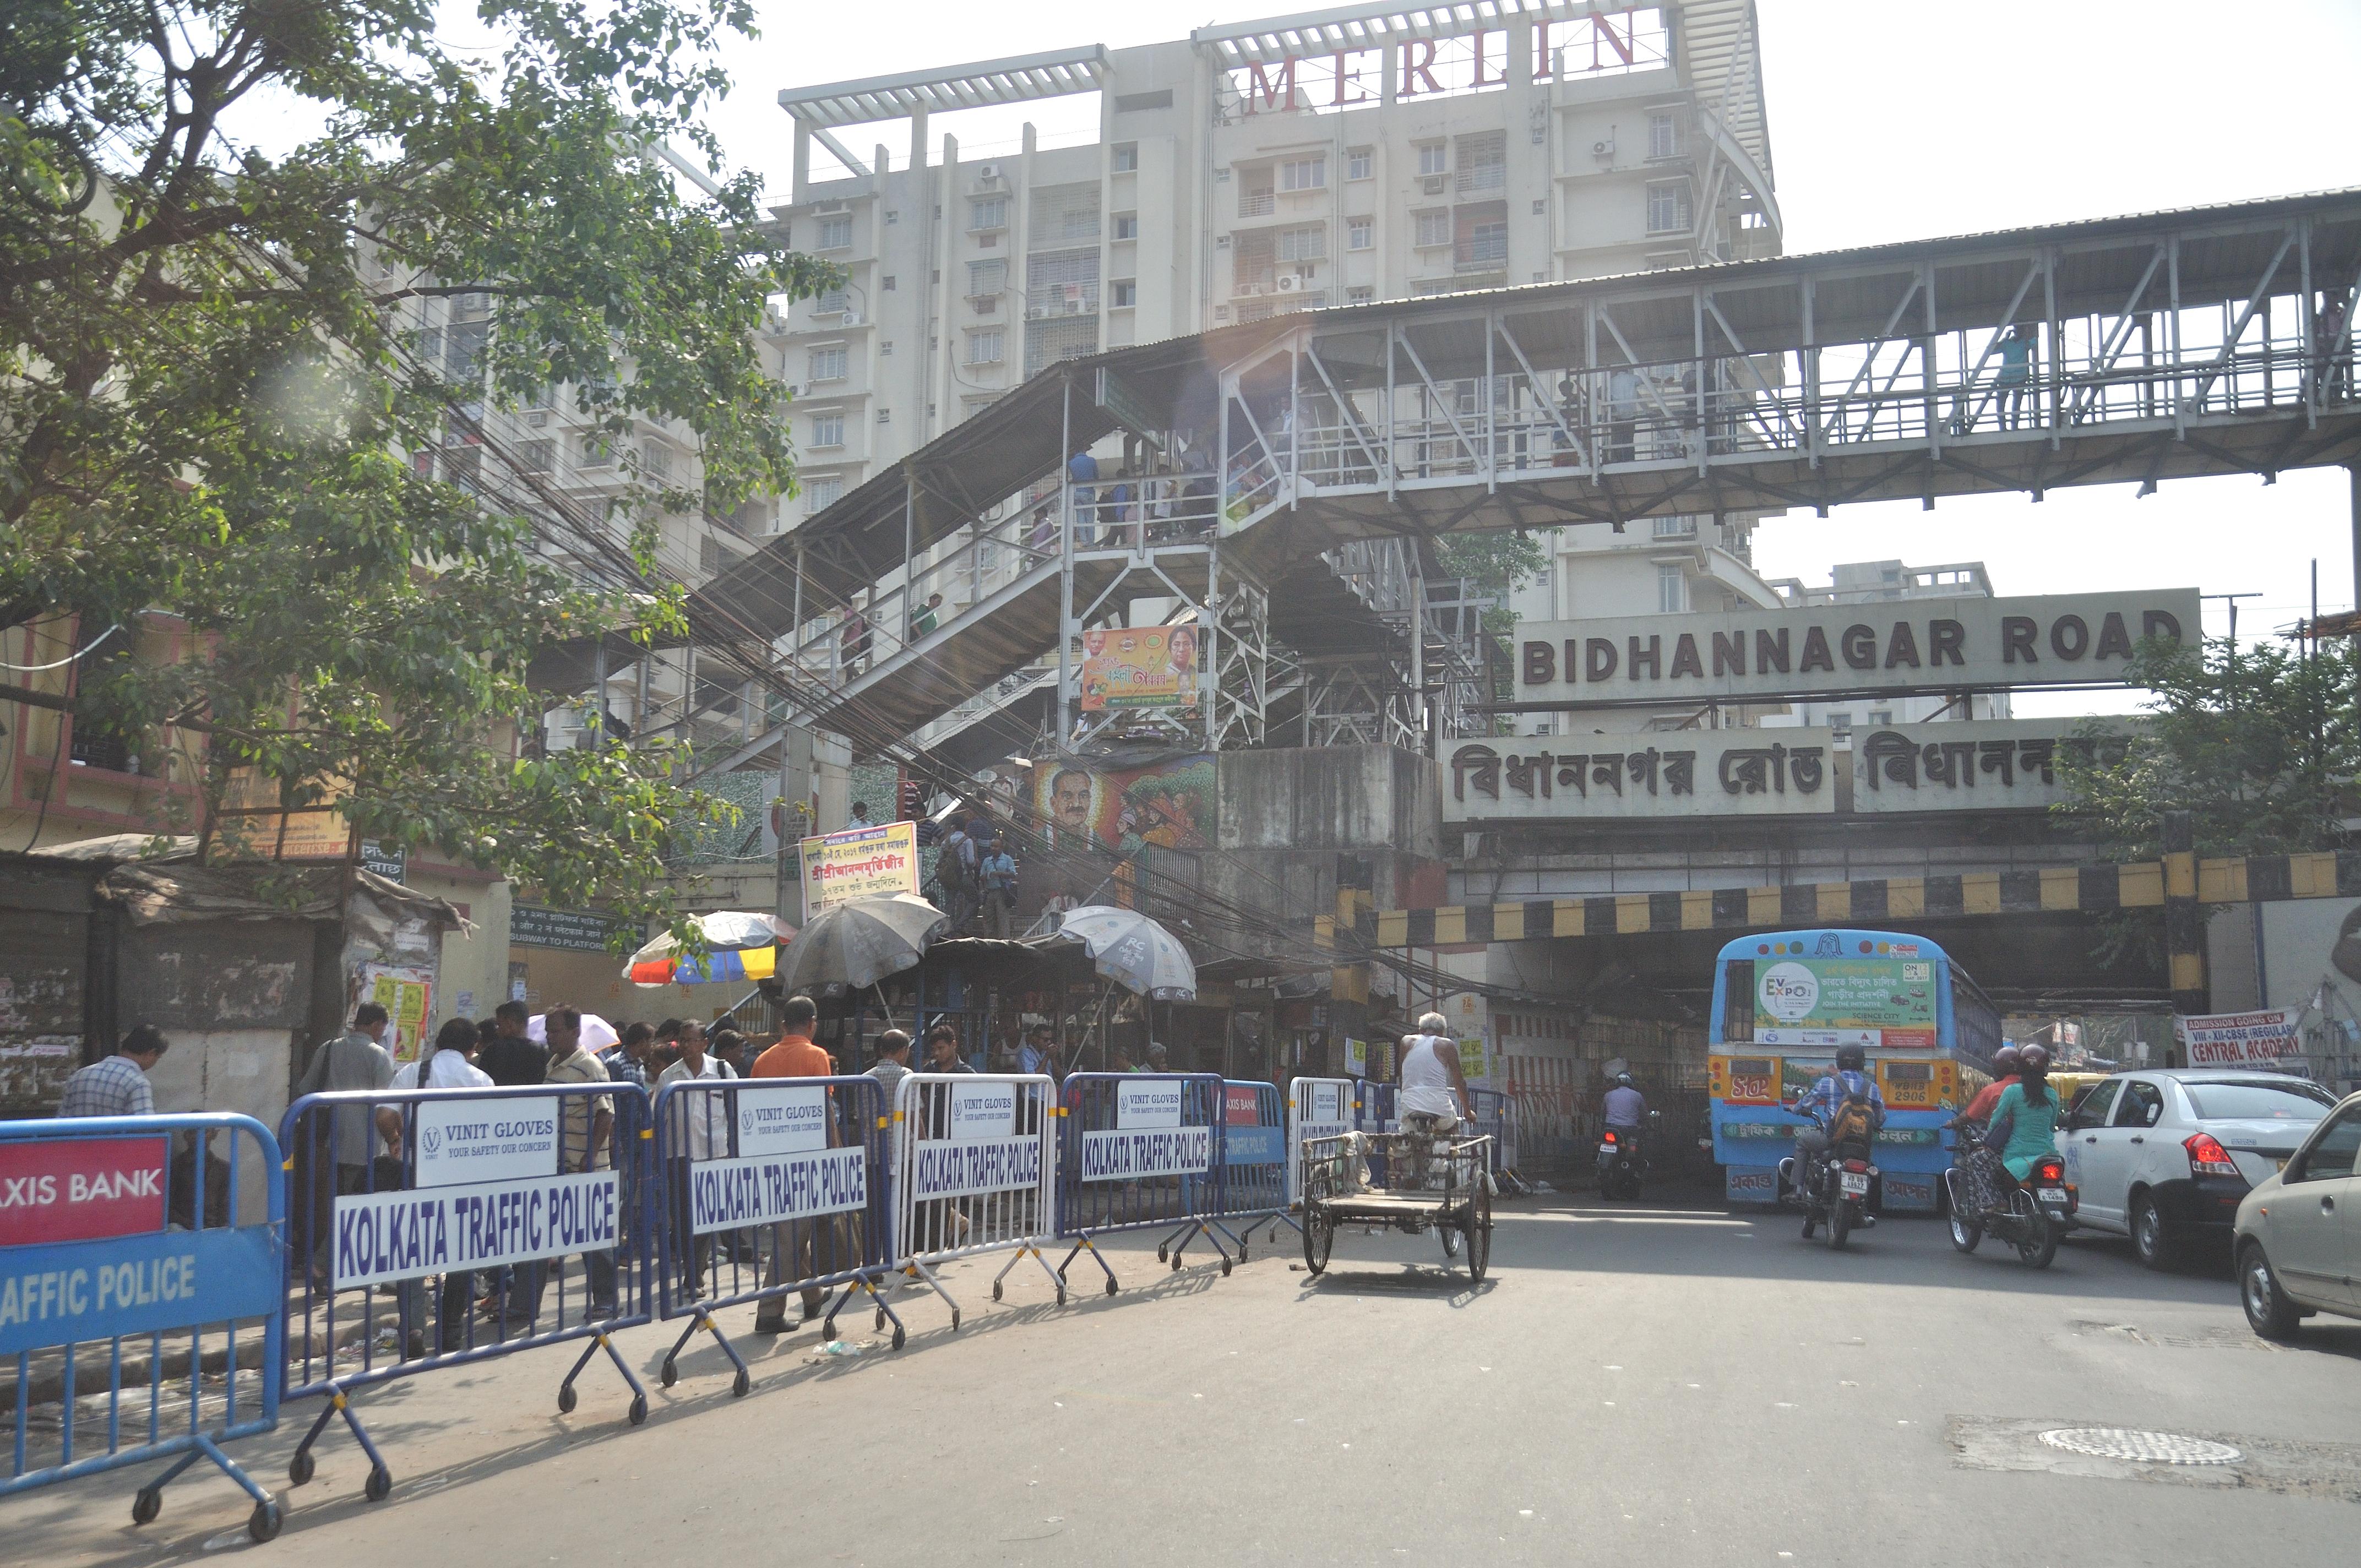 Bidhannagar_Road_Railway_Station_-_Ultadanga_Main_Road_-_Kolkata_2017-04-29_1726